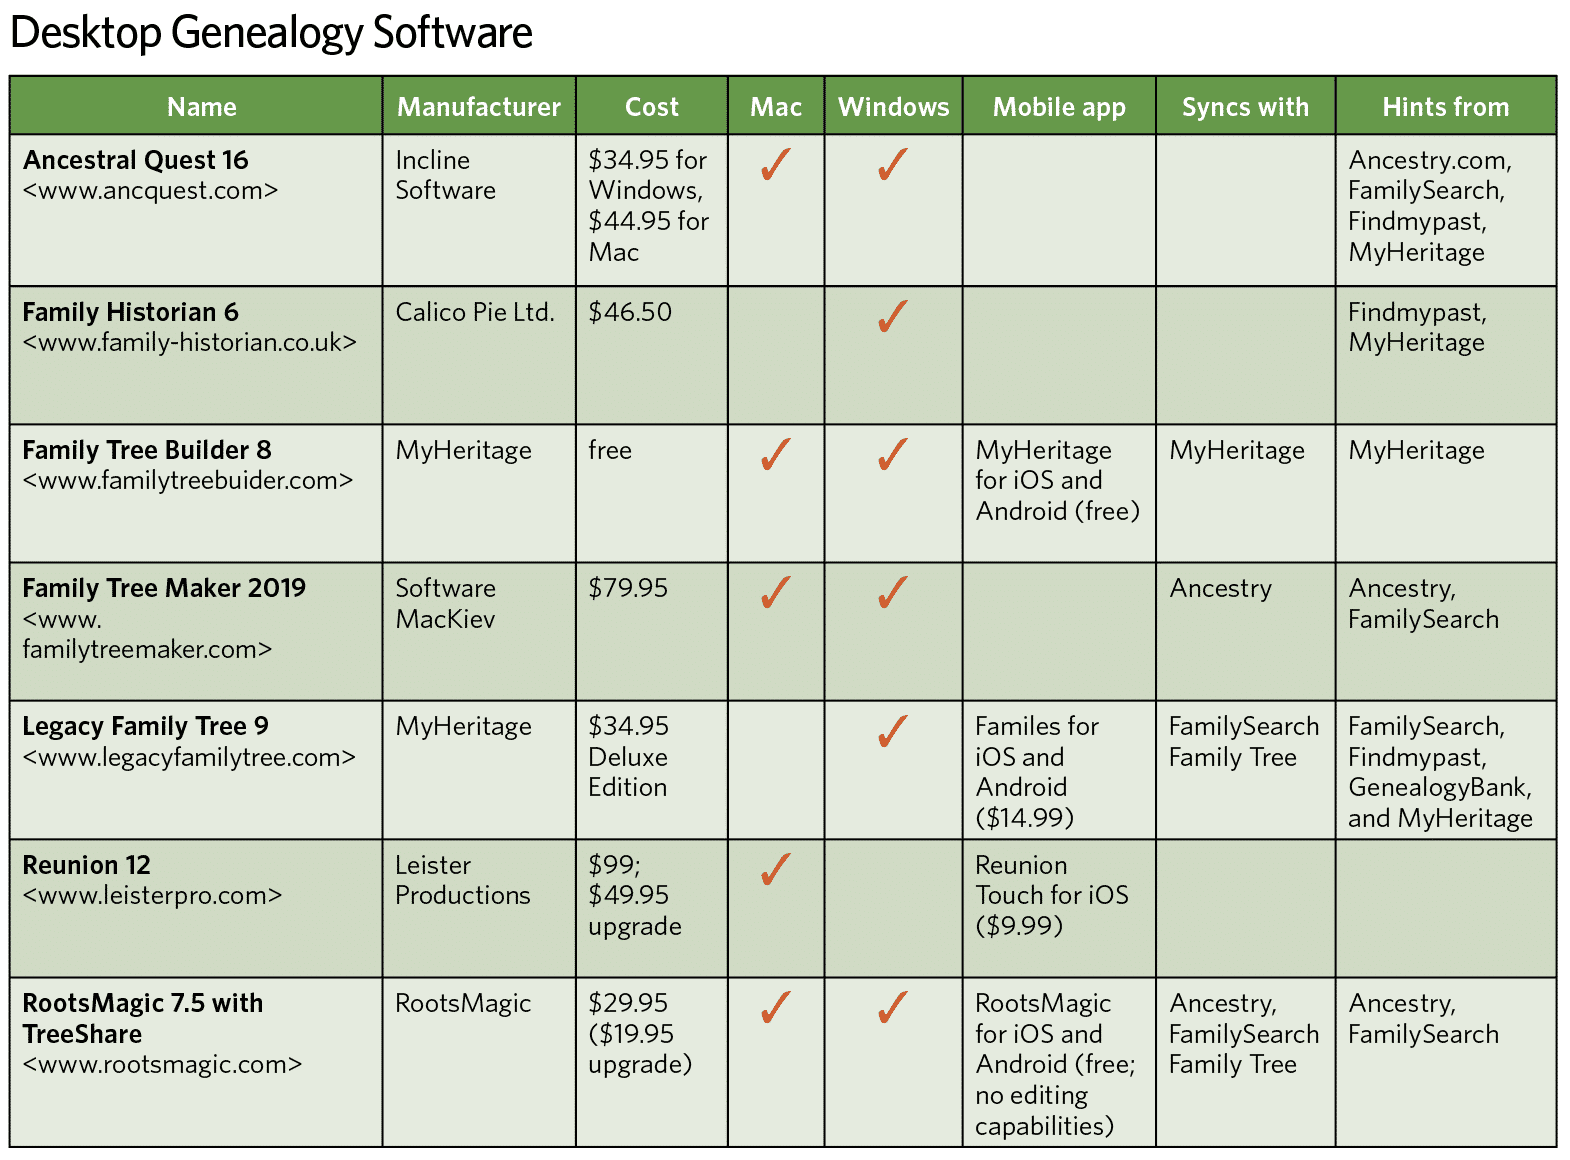 Desktop genealogy software comparison.